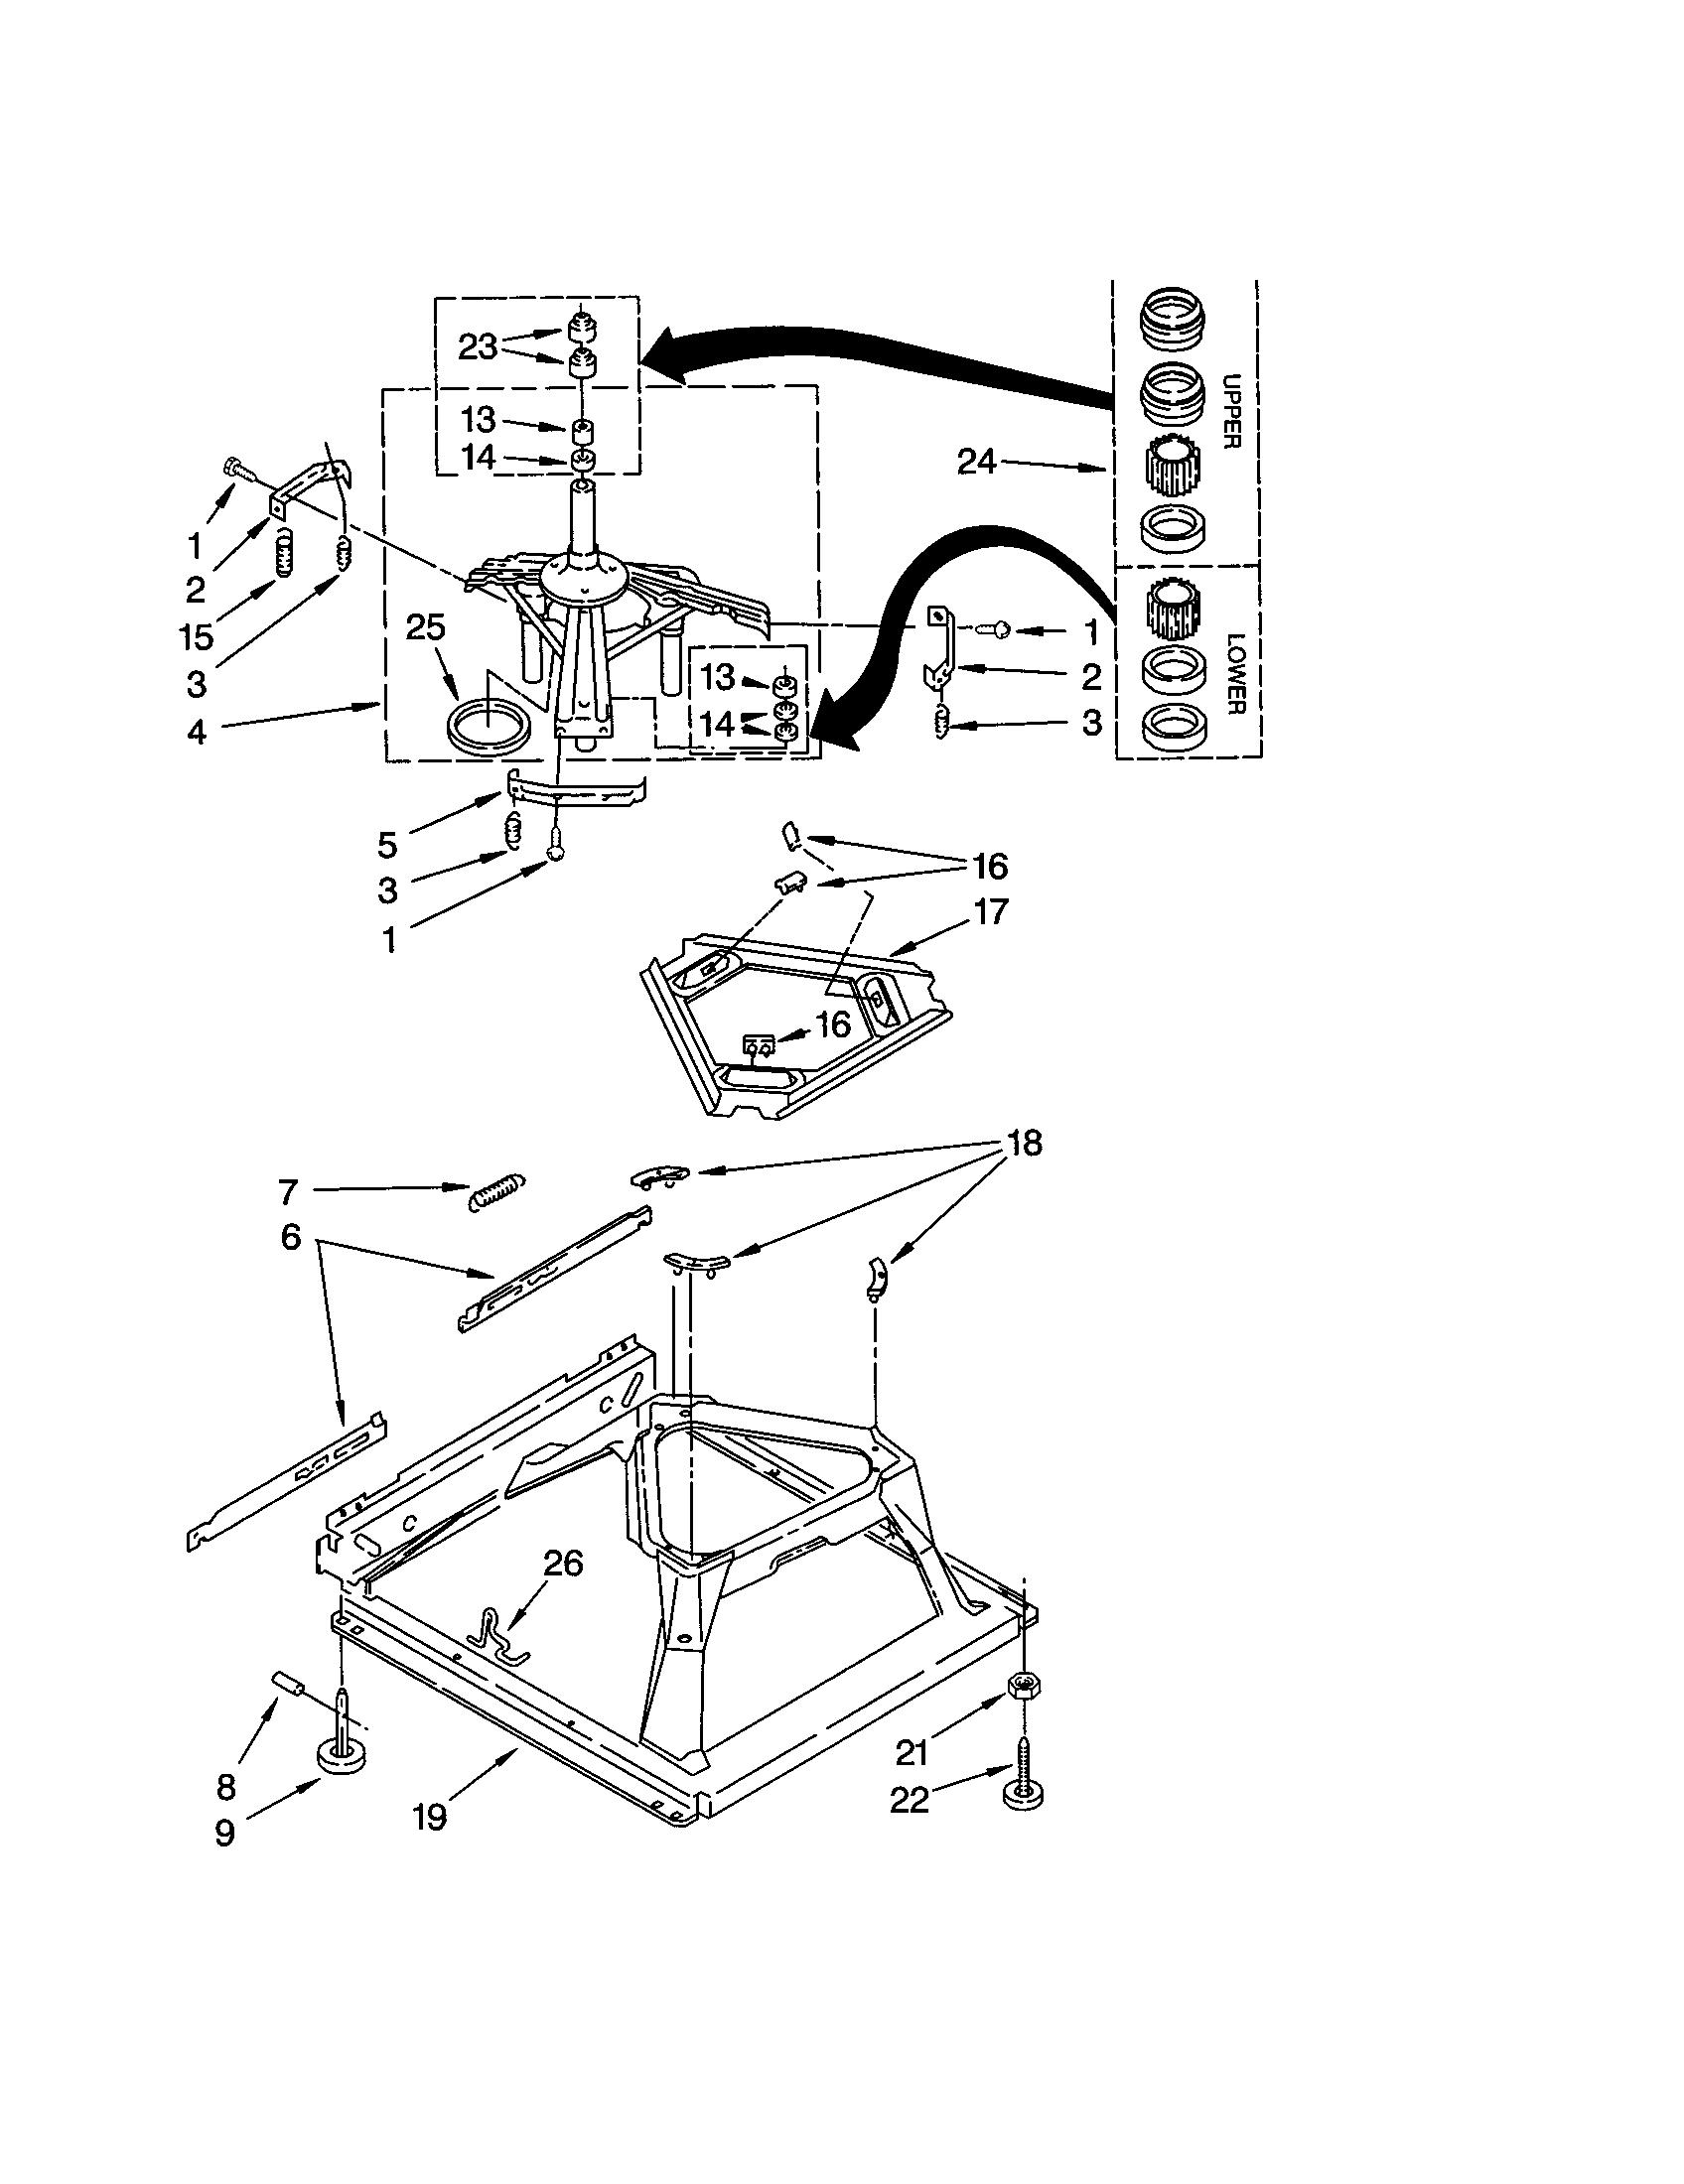 Kenmore-Elite model 11023034101 residential washers